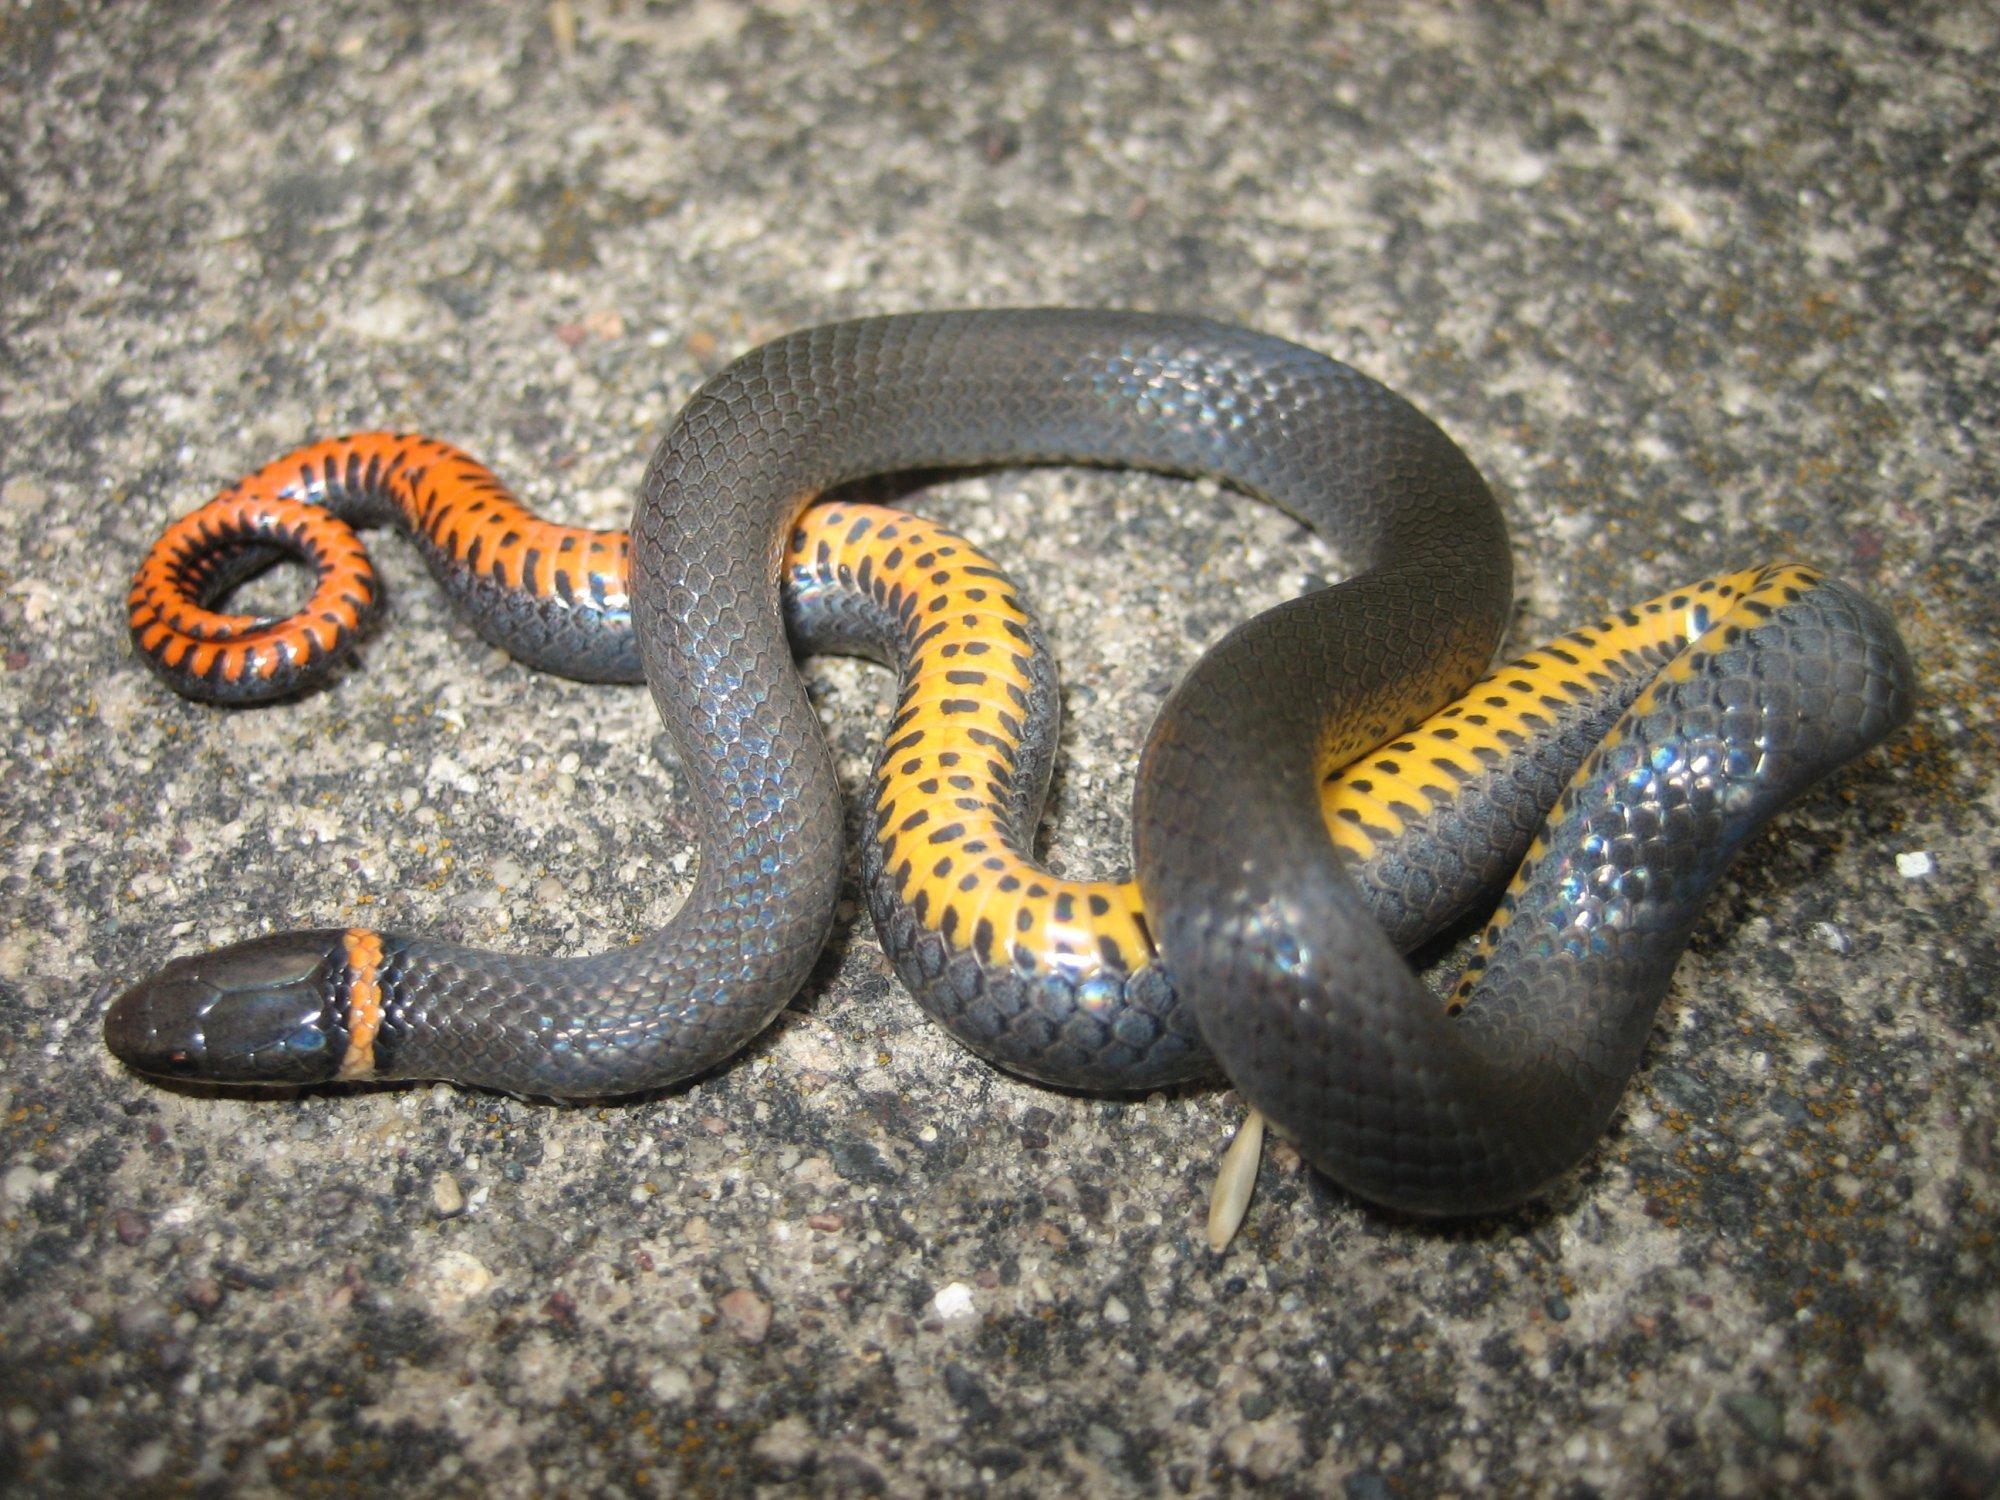 Mutable Iowa Baby Black Snake Bite Baby Black Snake Vs Baby Copperhead Prairie Ringneck Snake Diadophis Punctatus Arnyi Snakes houzz 01 Baby Black Snake